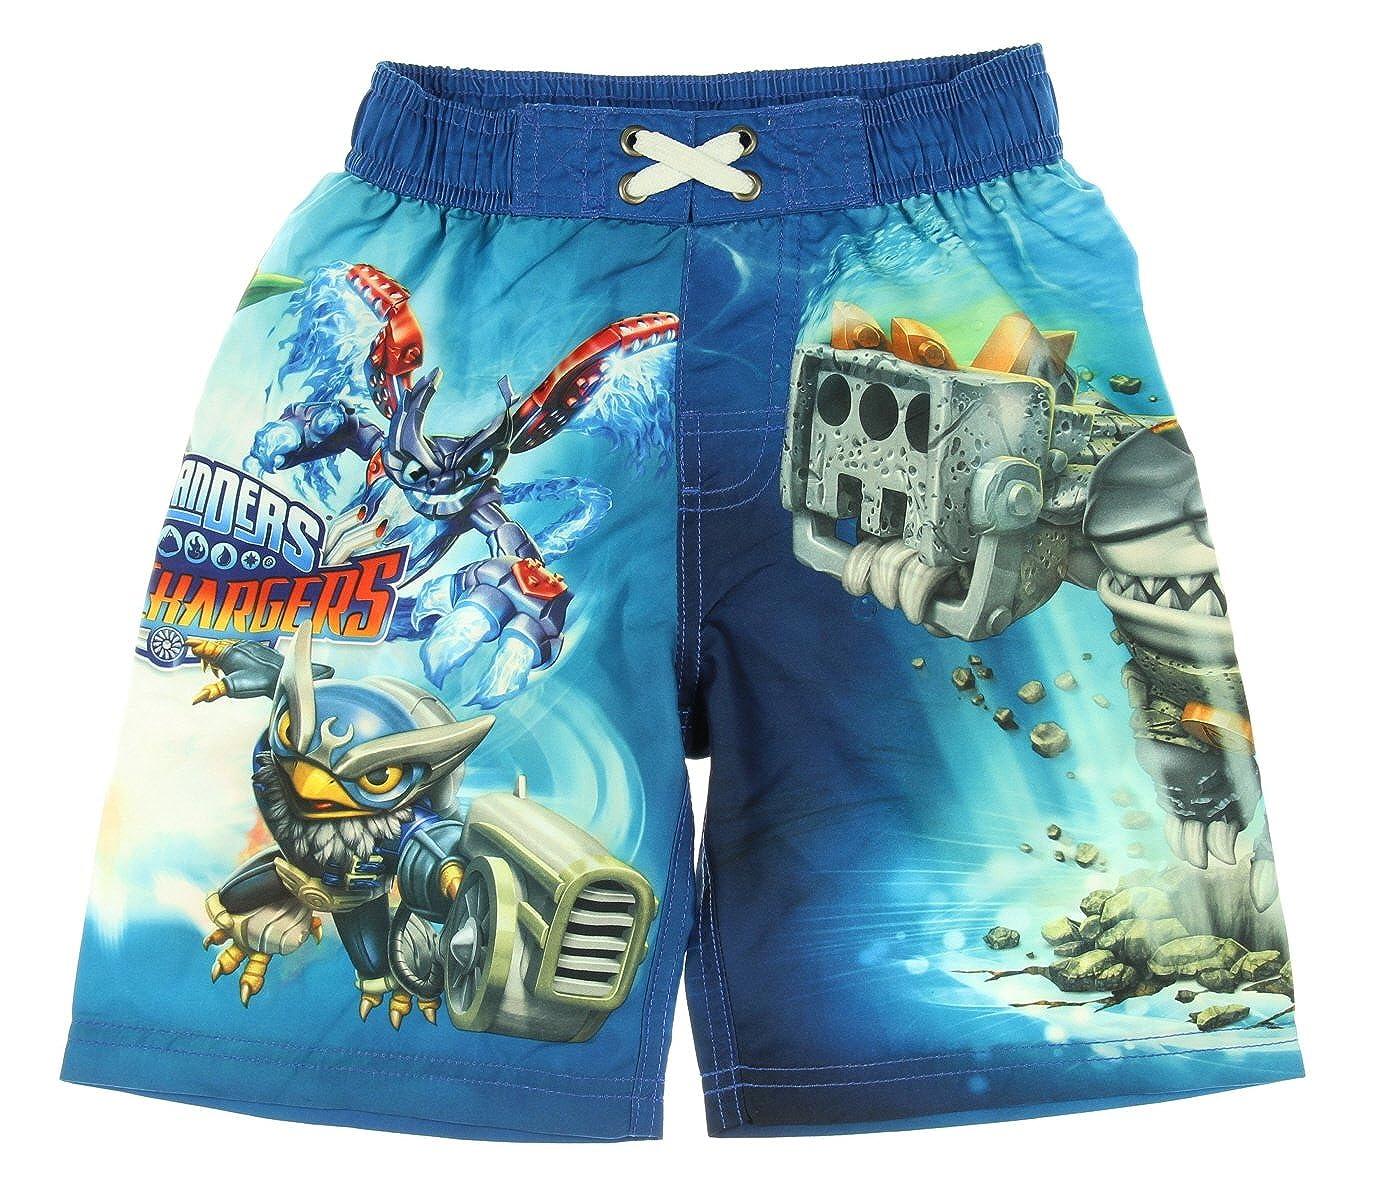 Skylanders Boys' Swim Trunks Shorts